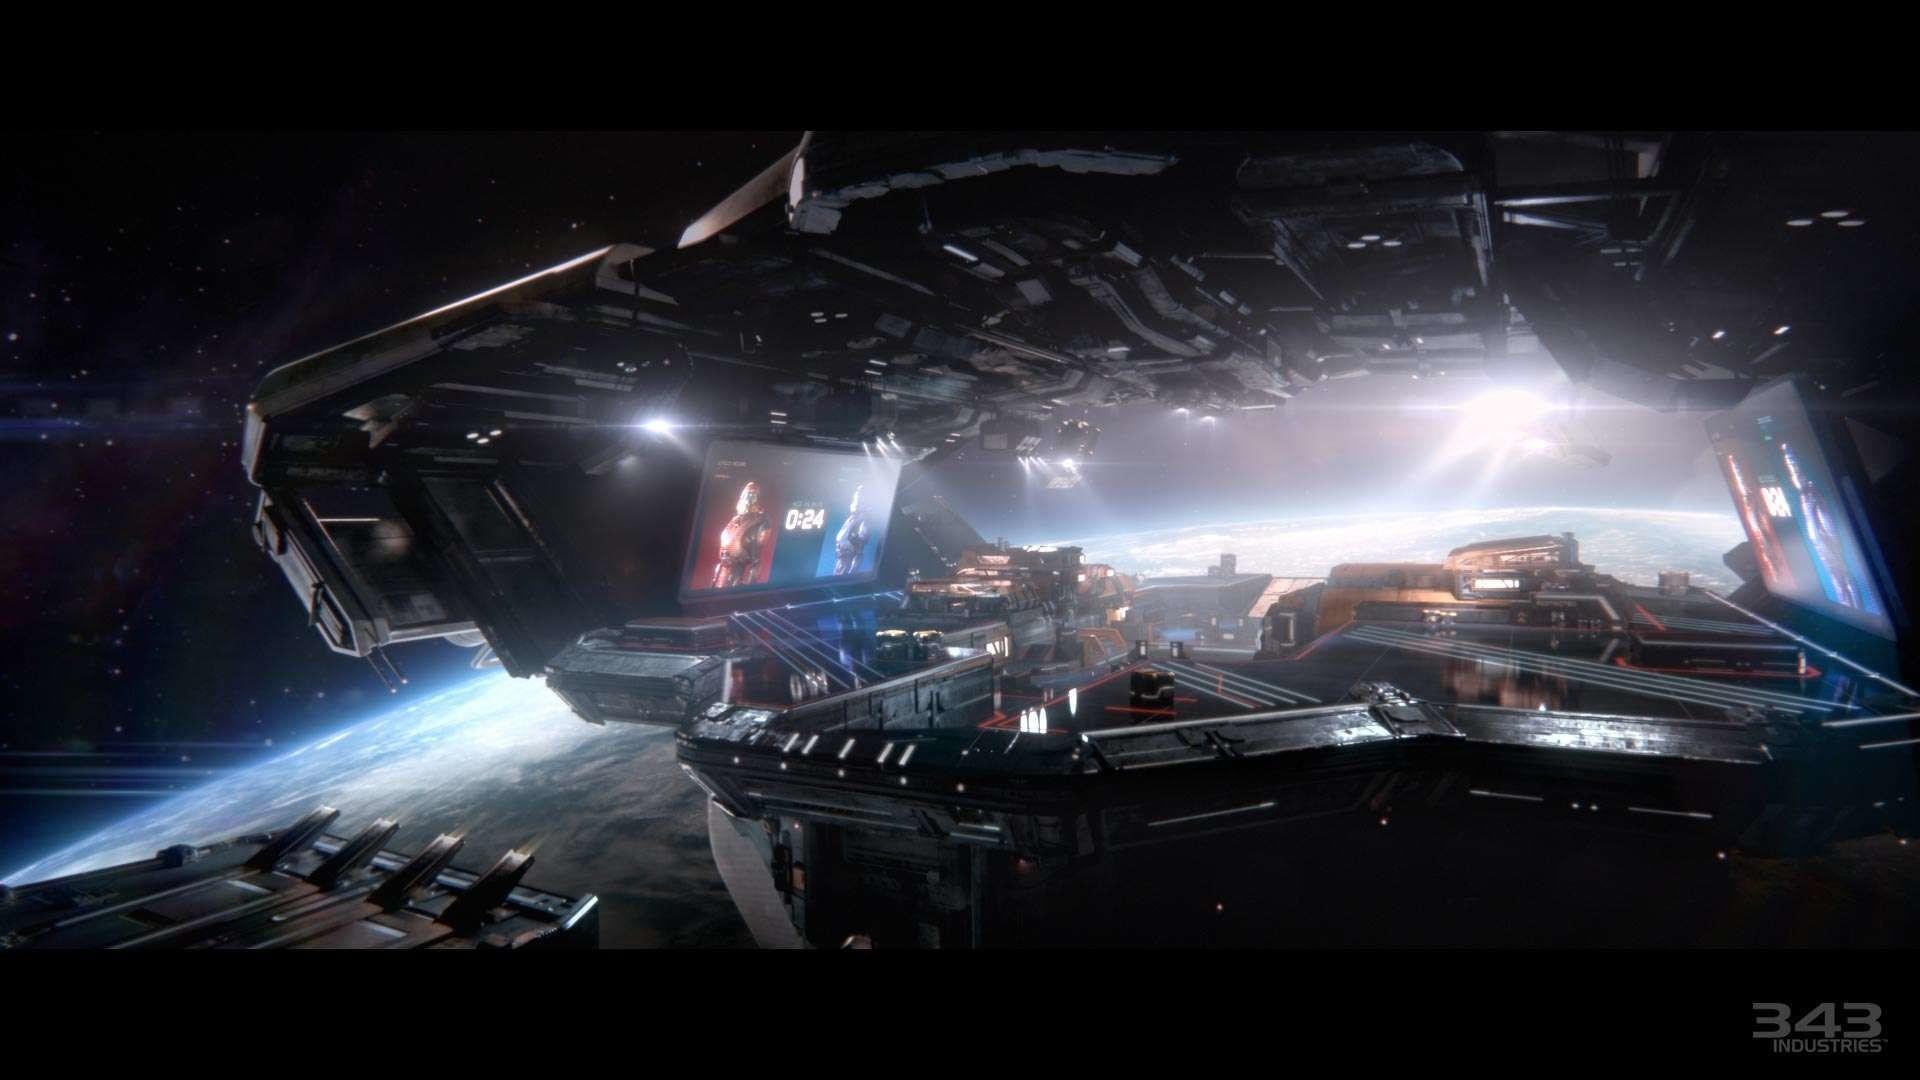 Wallpaper: Halo 5 Guardians 05 HD Wallpaper. Upload at October 2, 2014 .